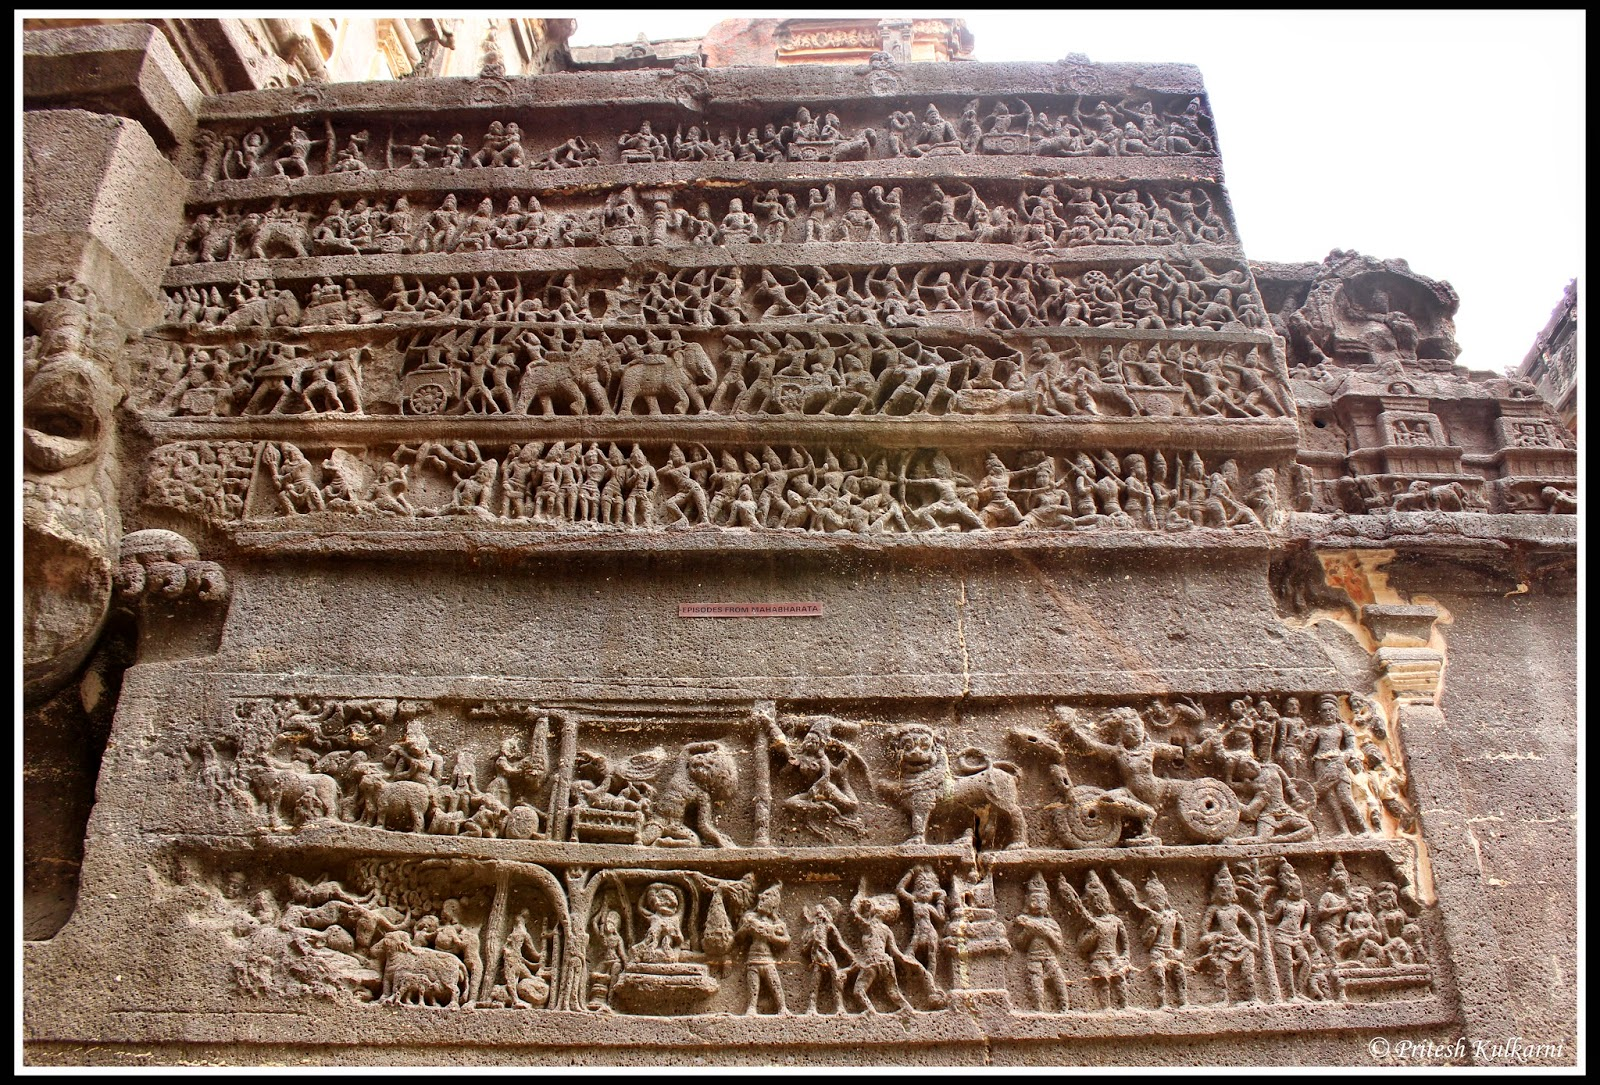 War story of epic Mahabharata